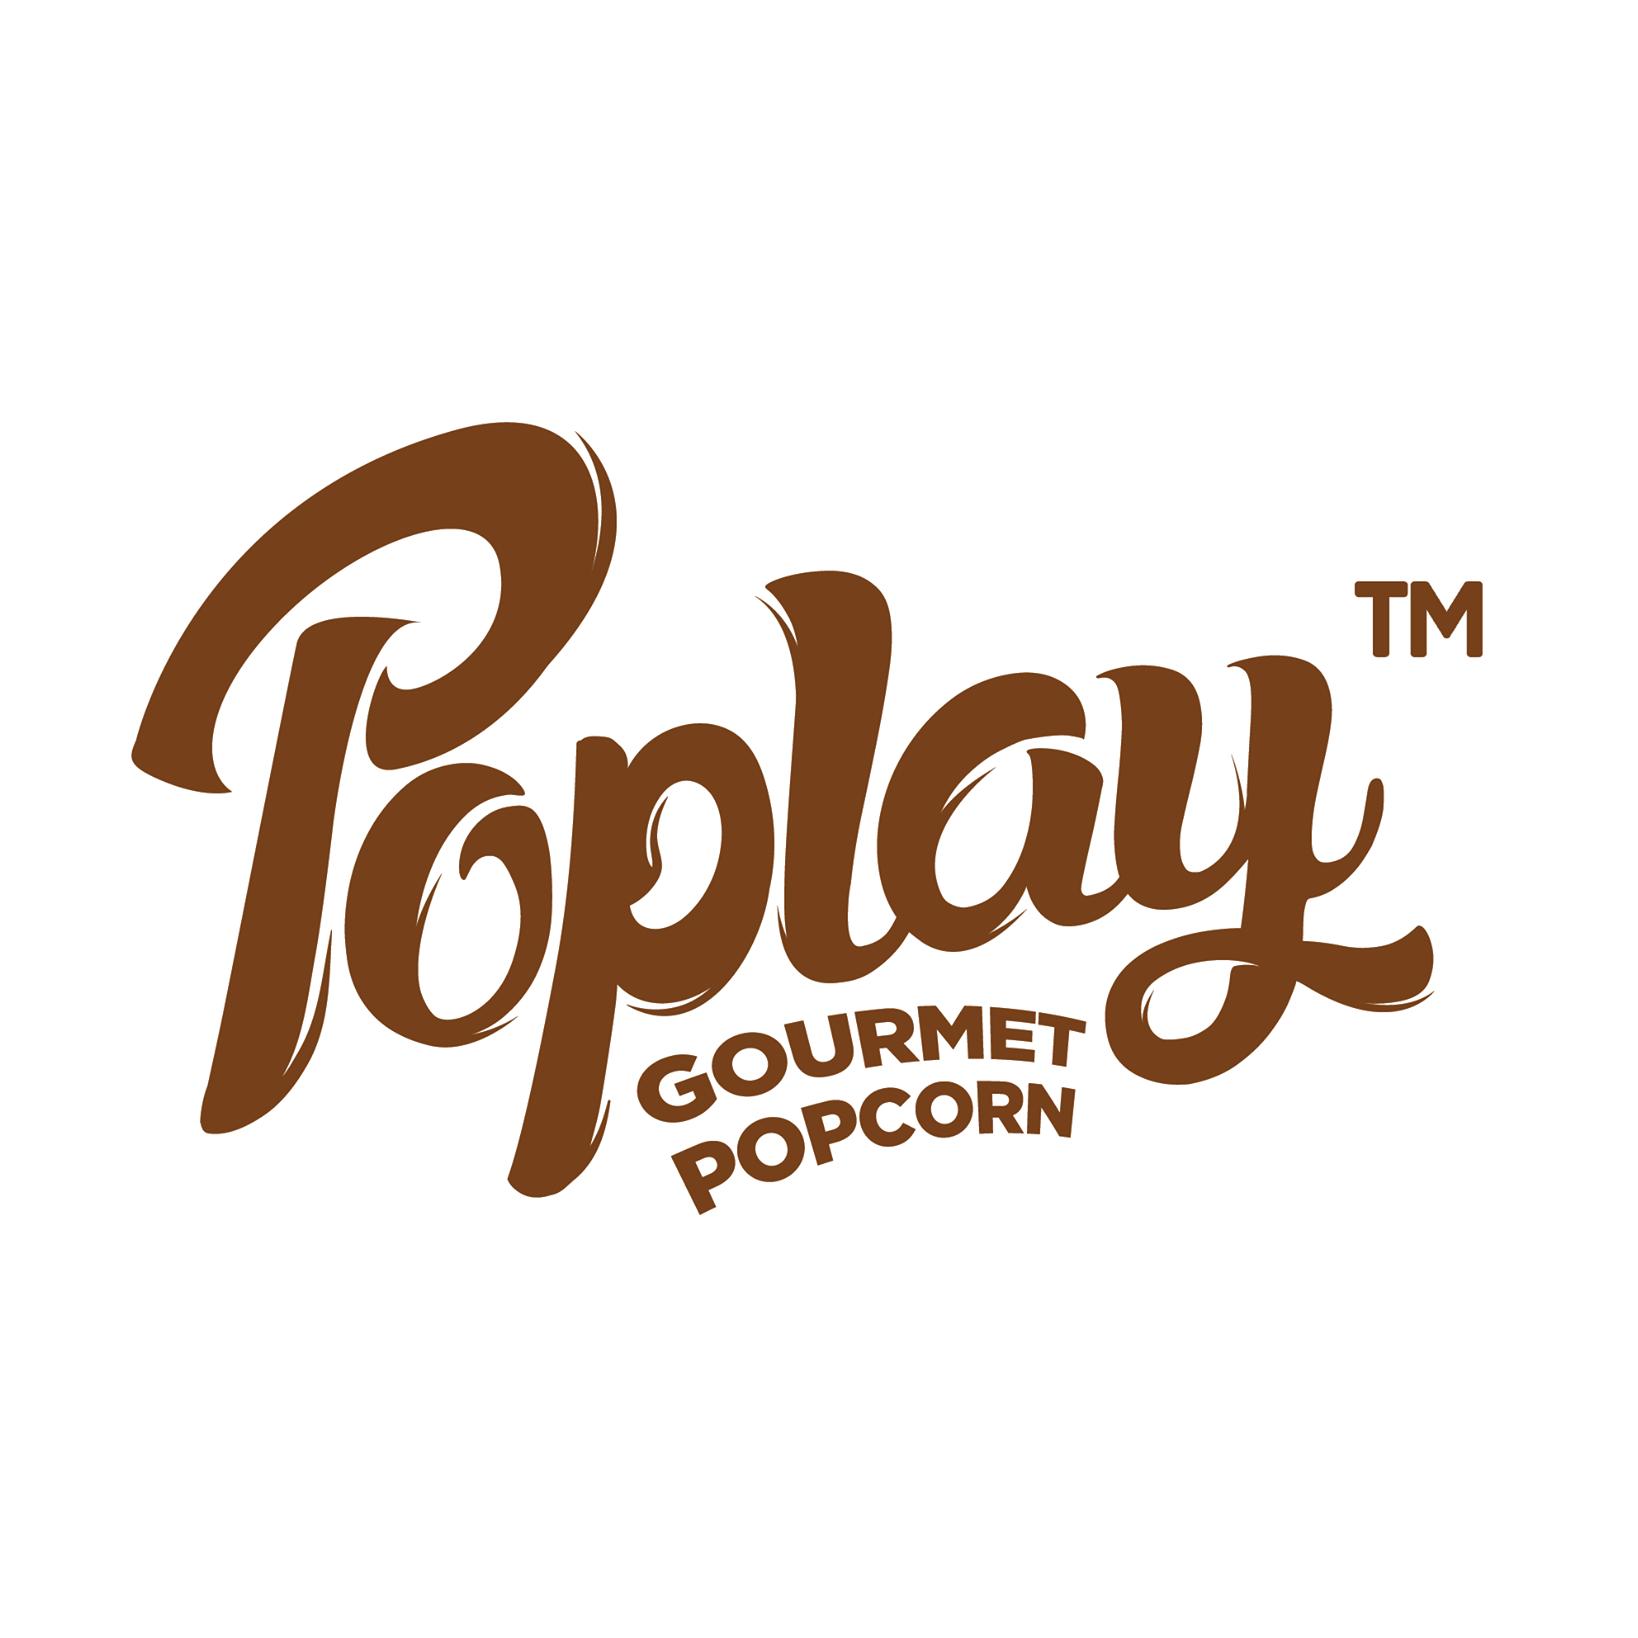 Poplay Gourmet Popcorn